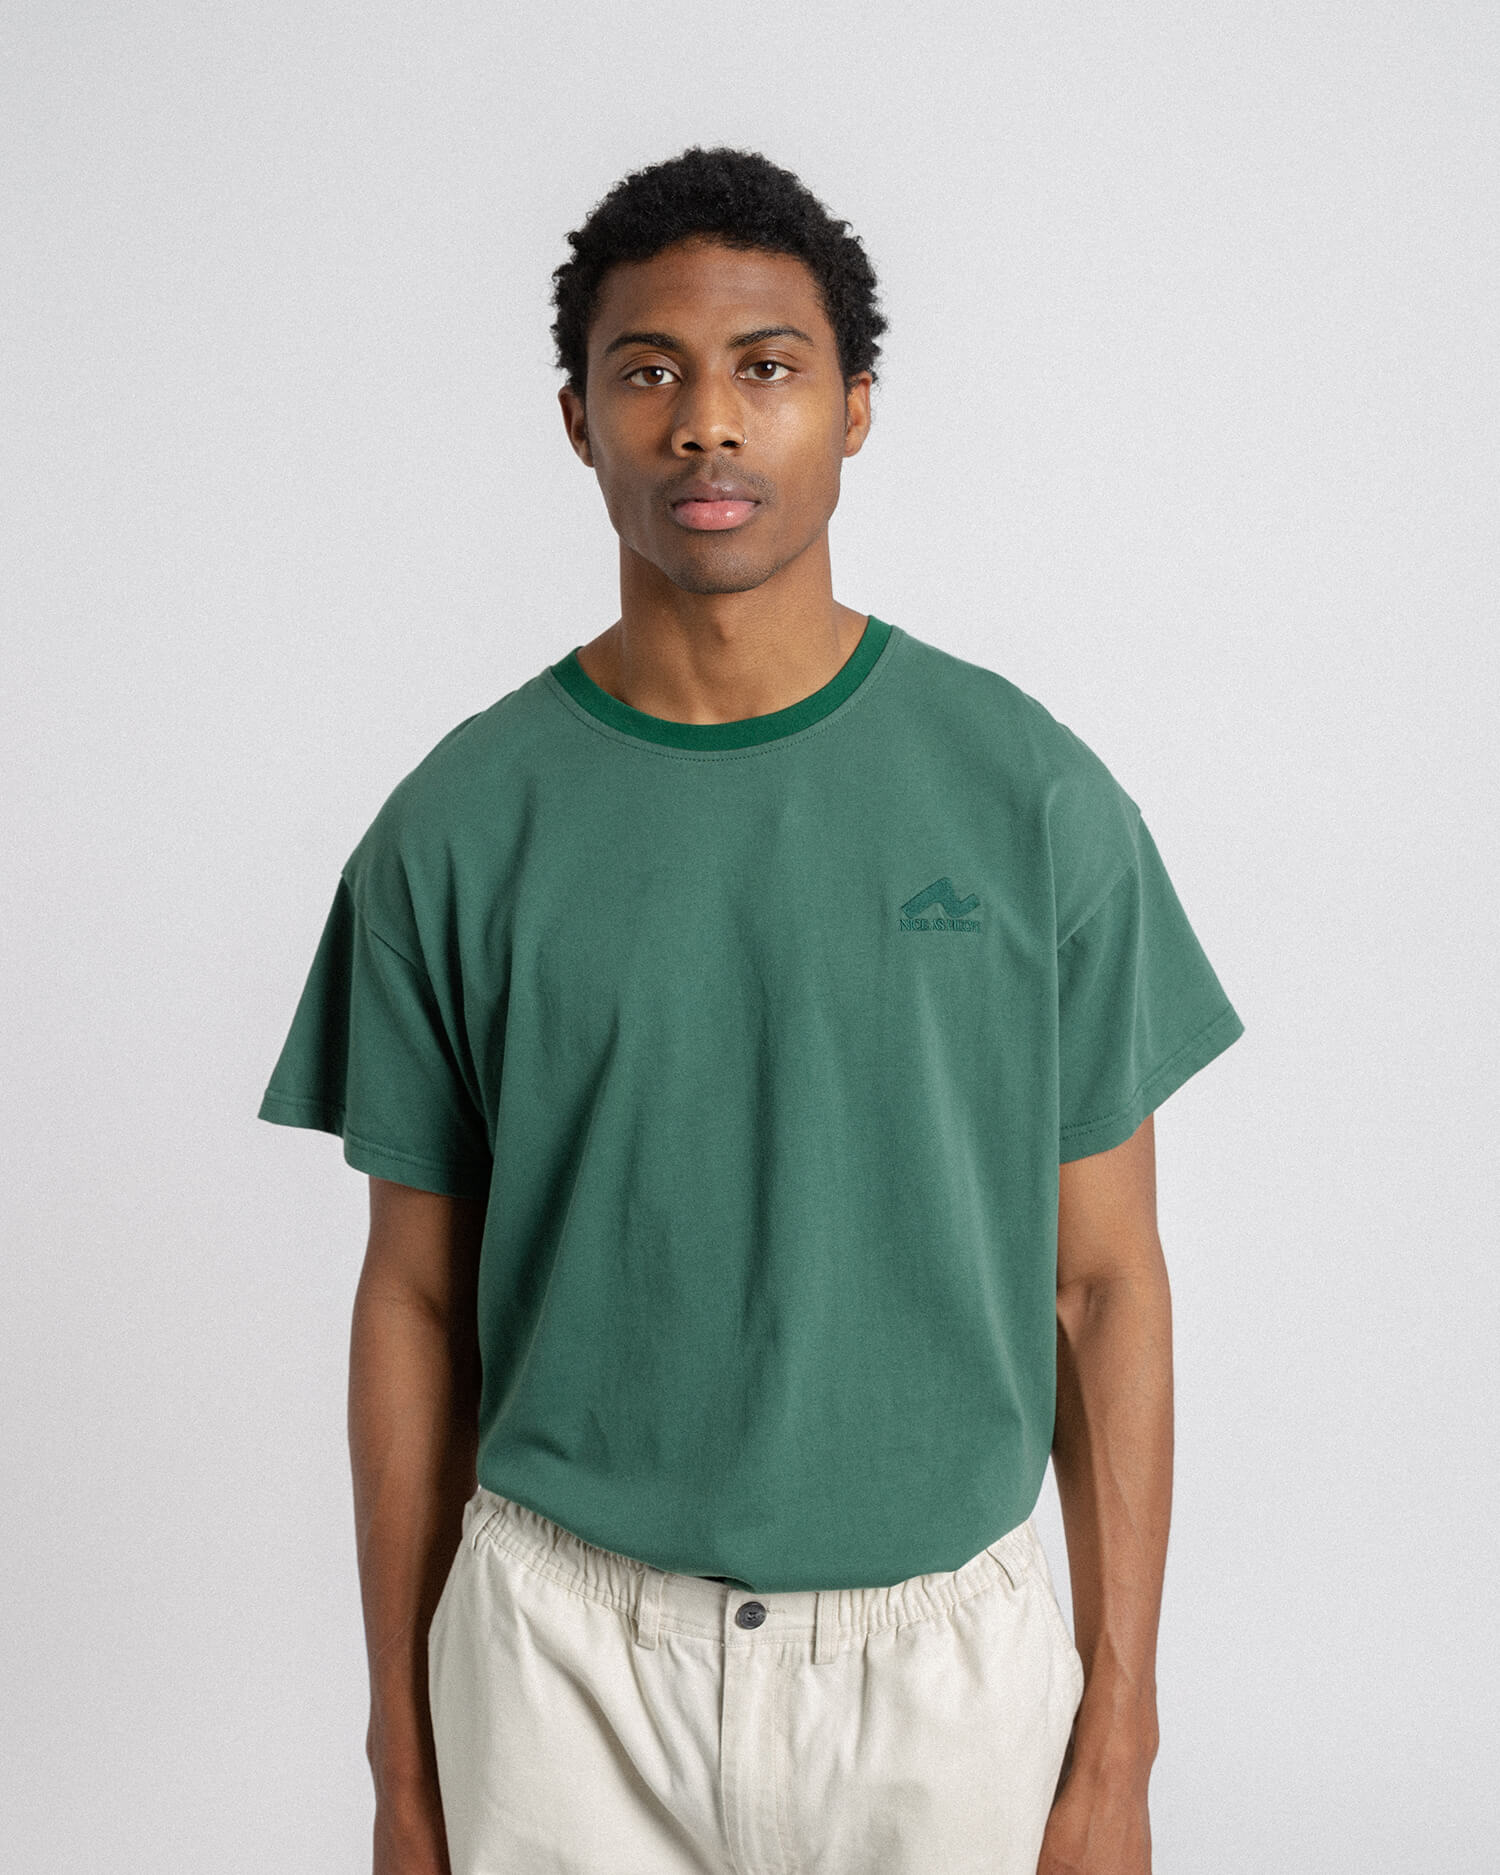 male model front view of green weekender tee